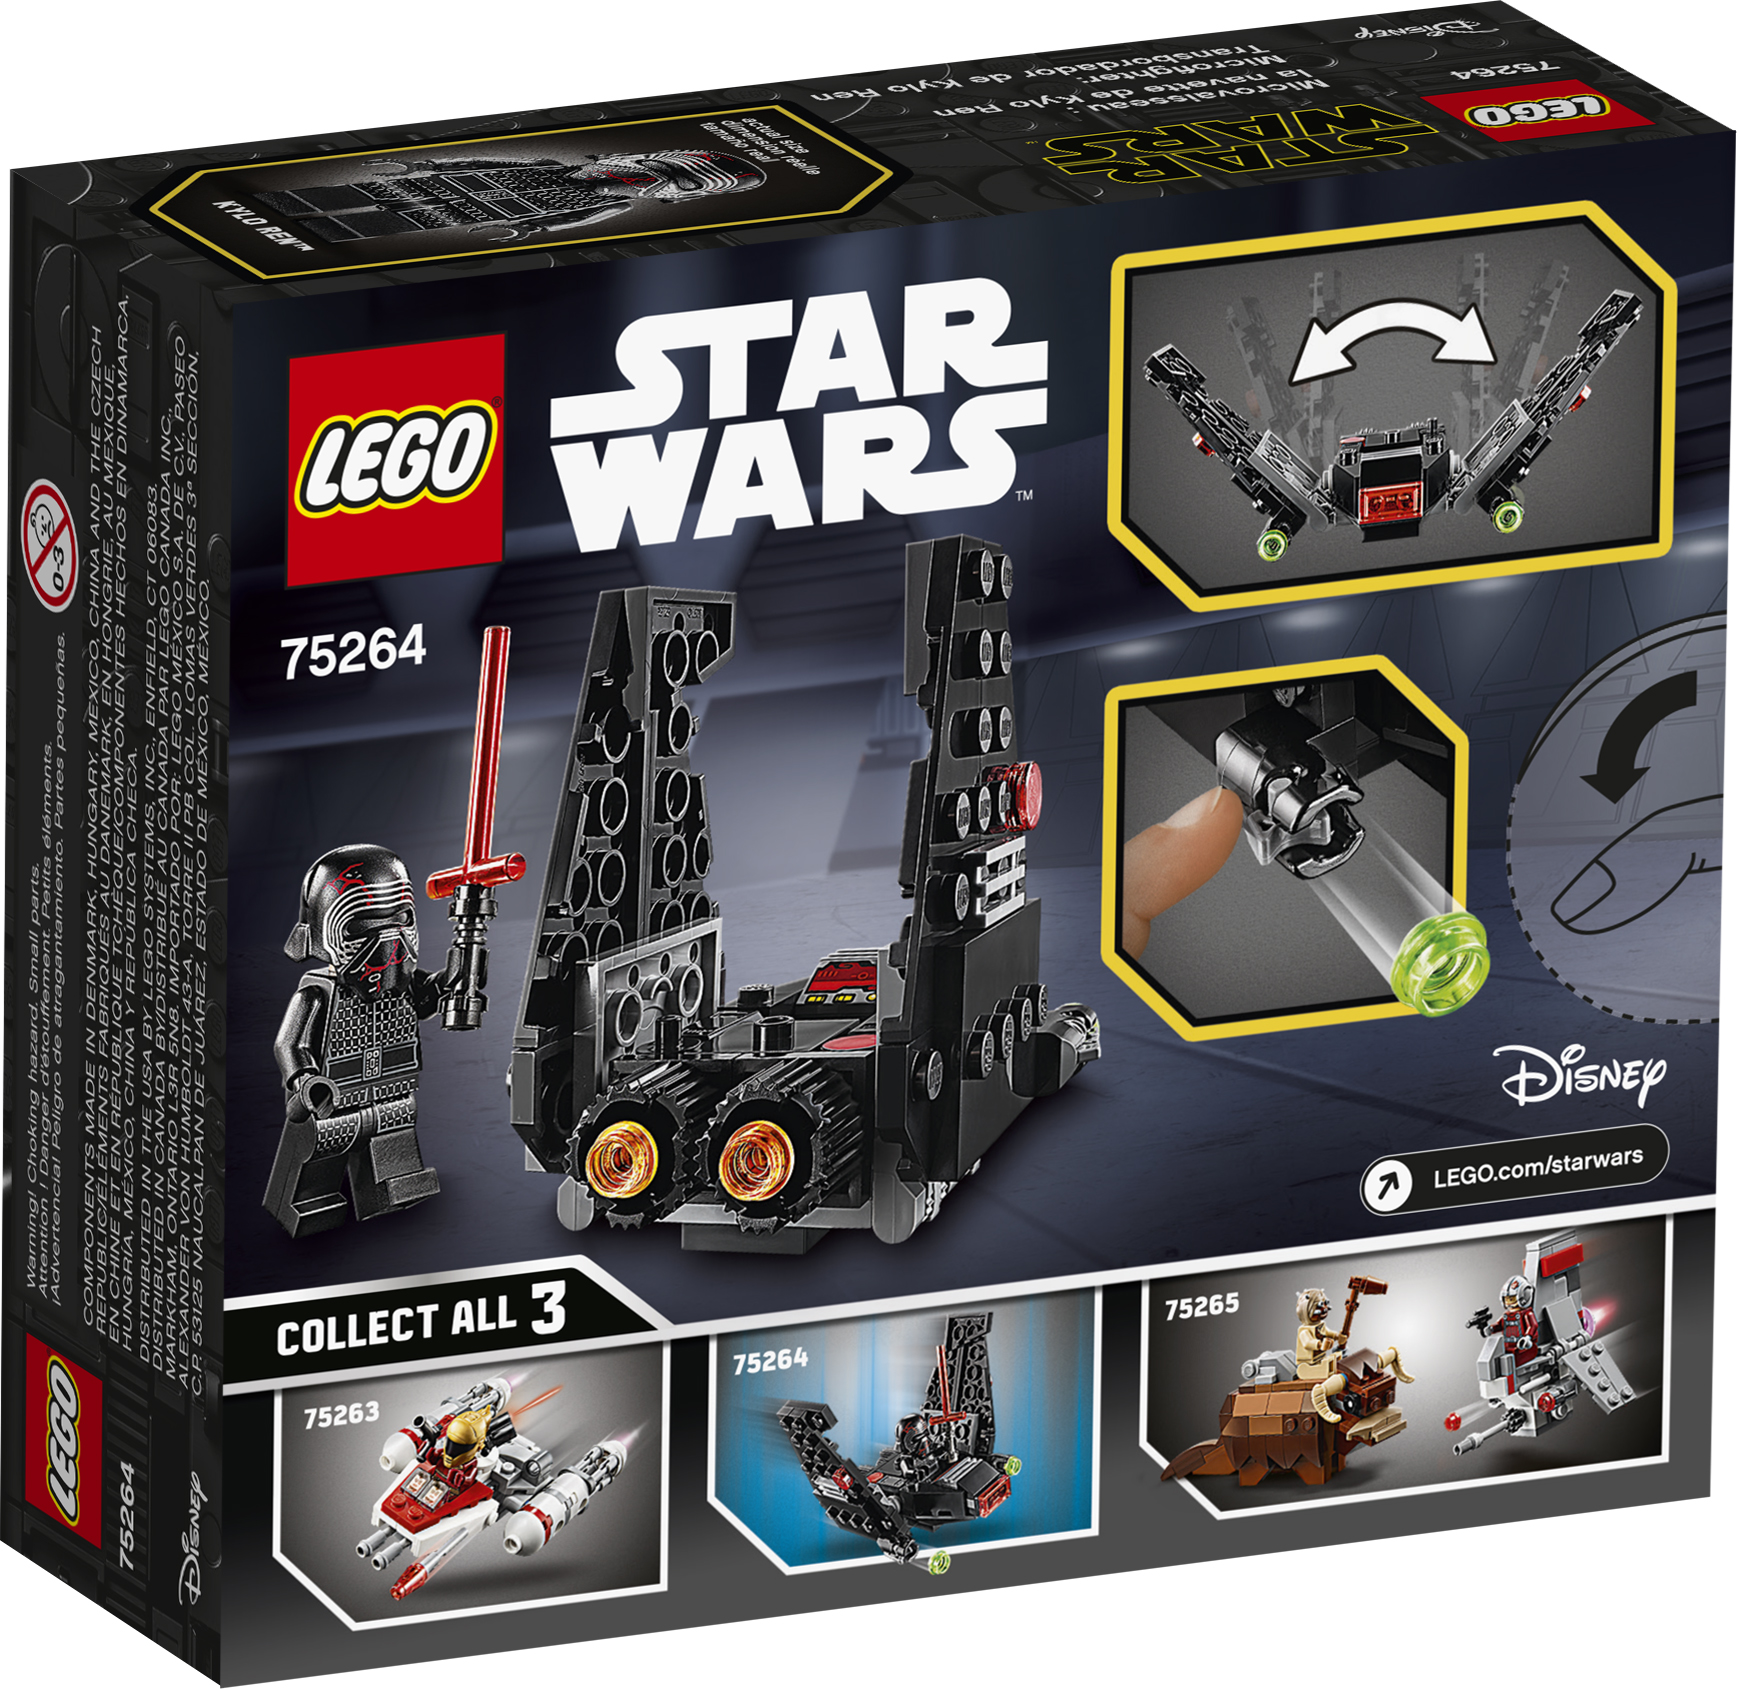 TROS Kylo Ren's Shuttle Microfighter Lego set 2